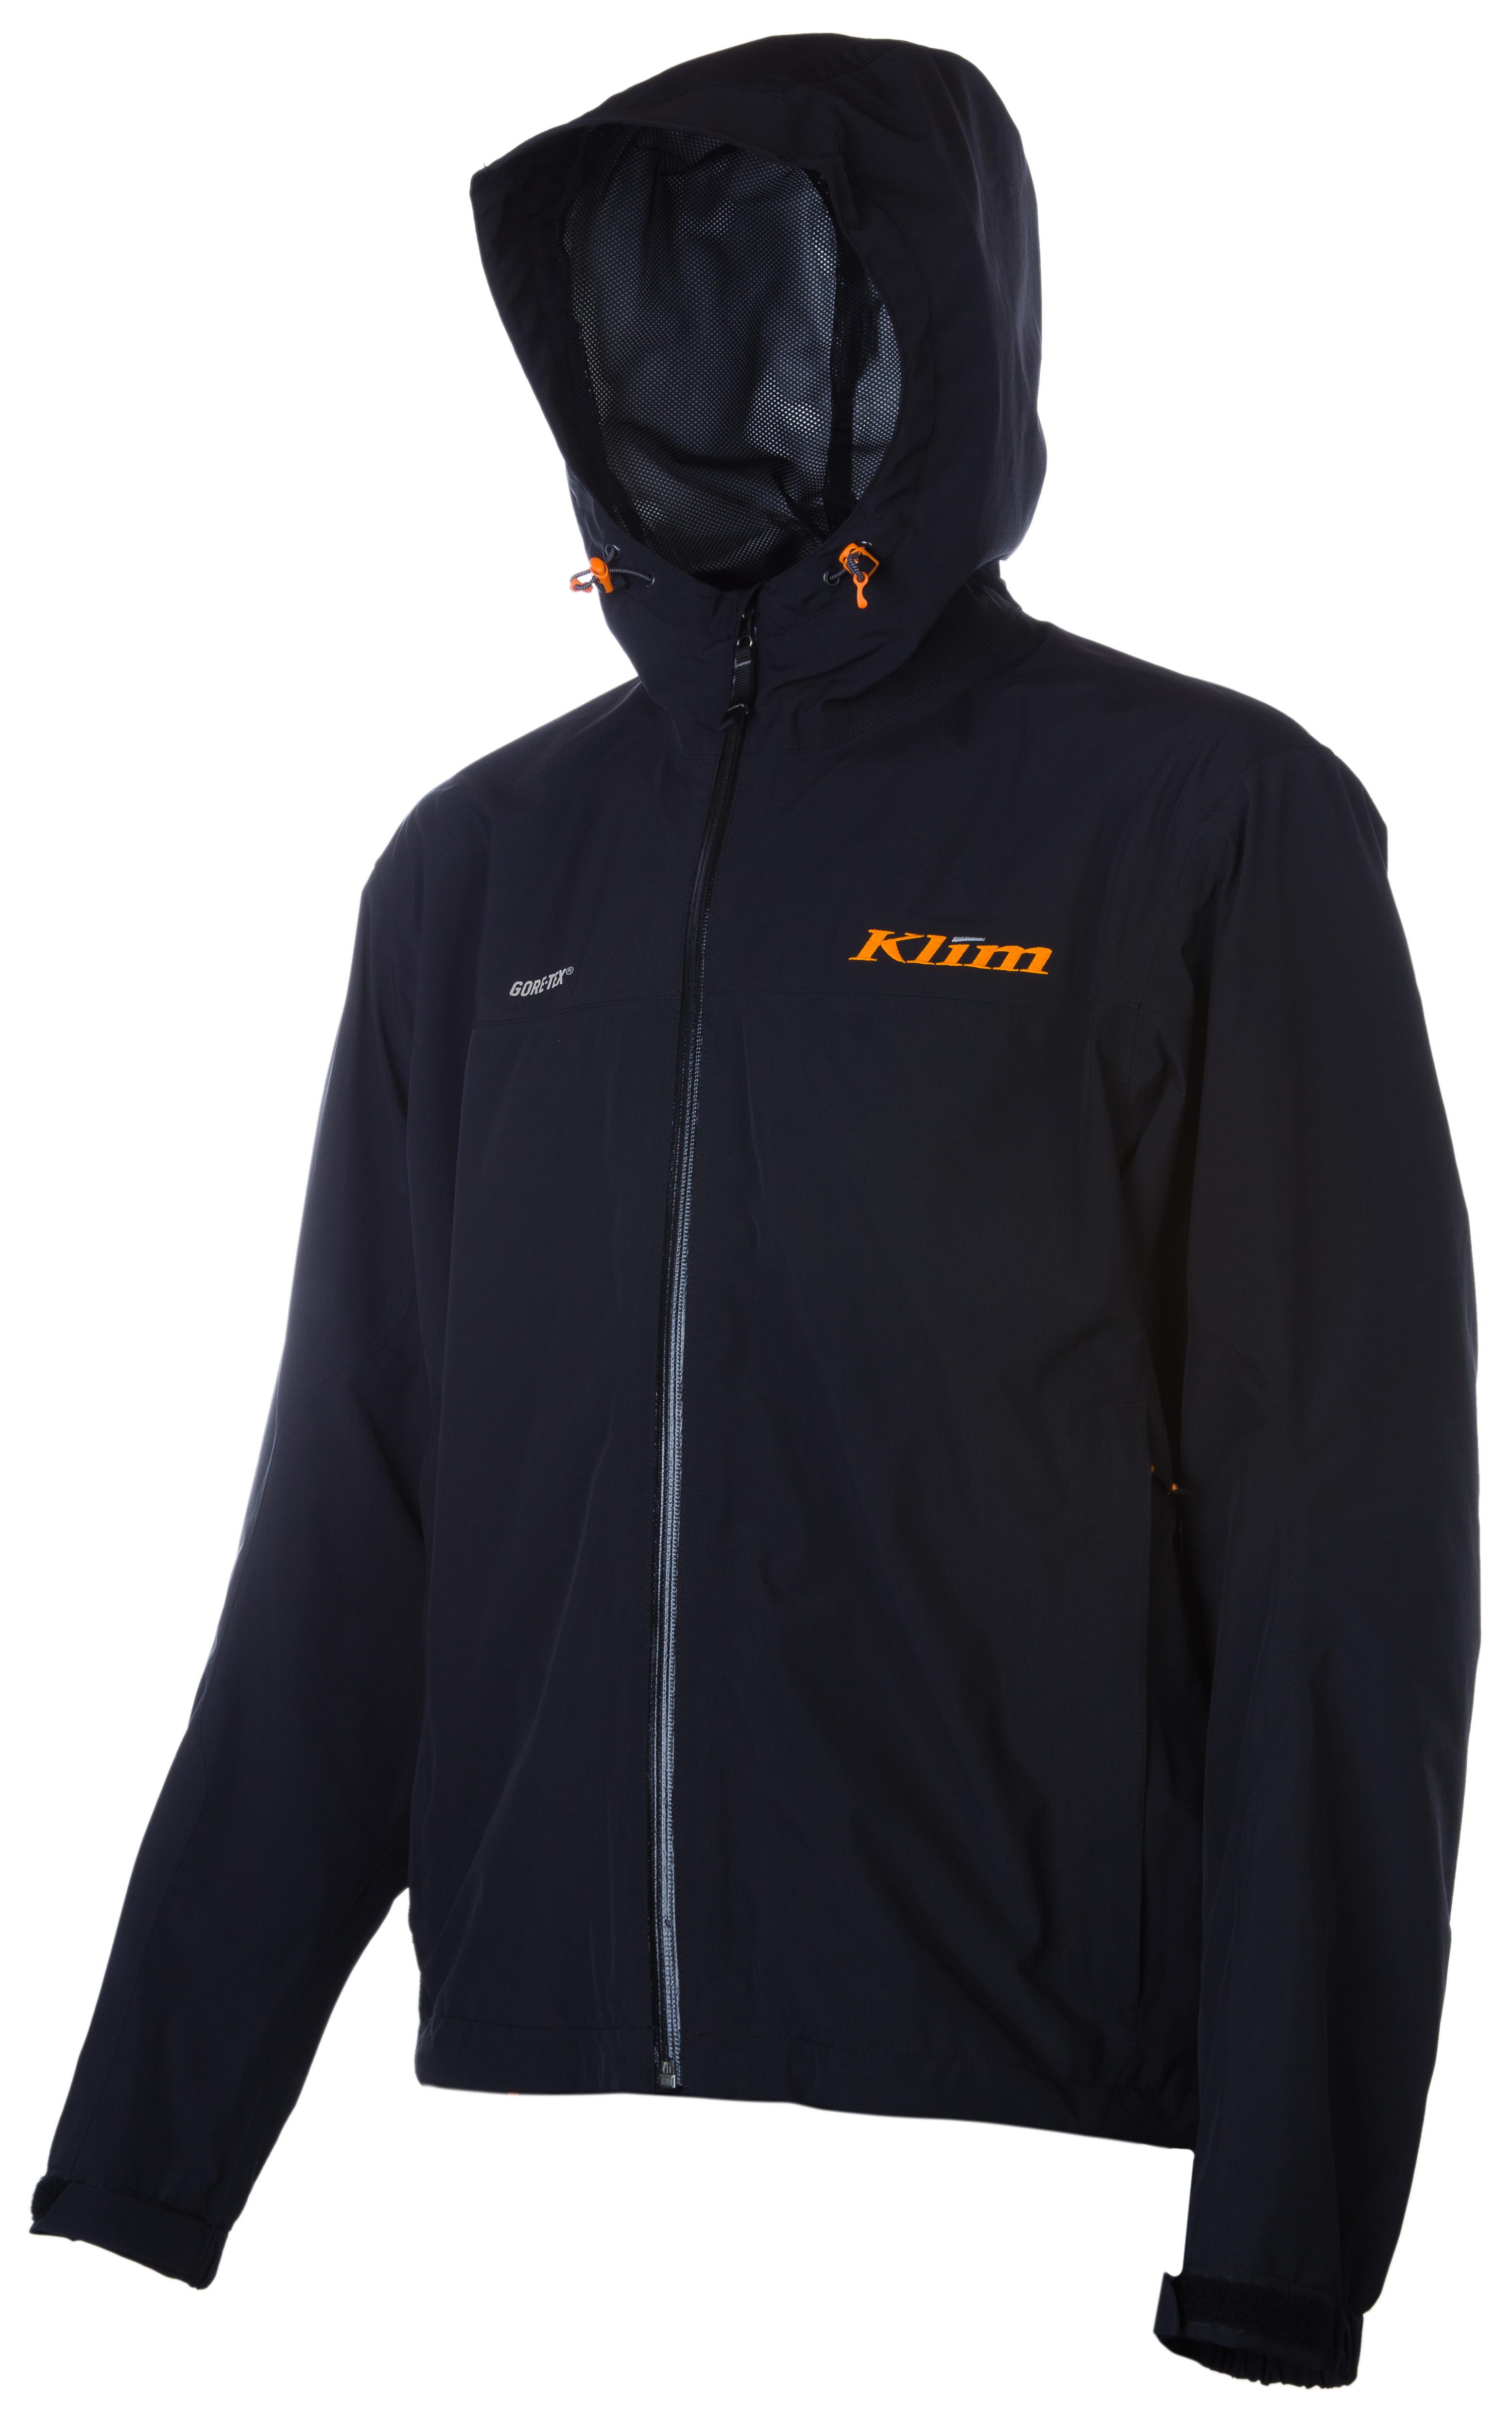 Stow Away Jacket 3148-002-040